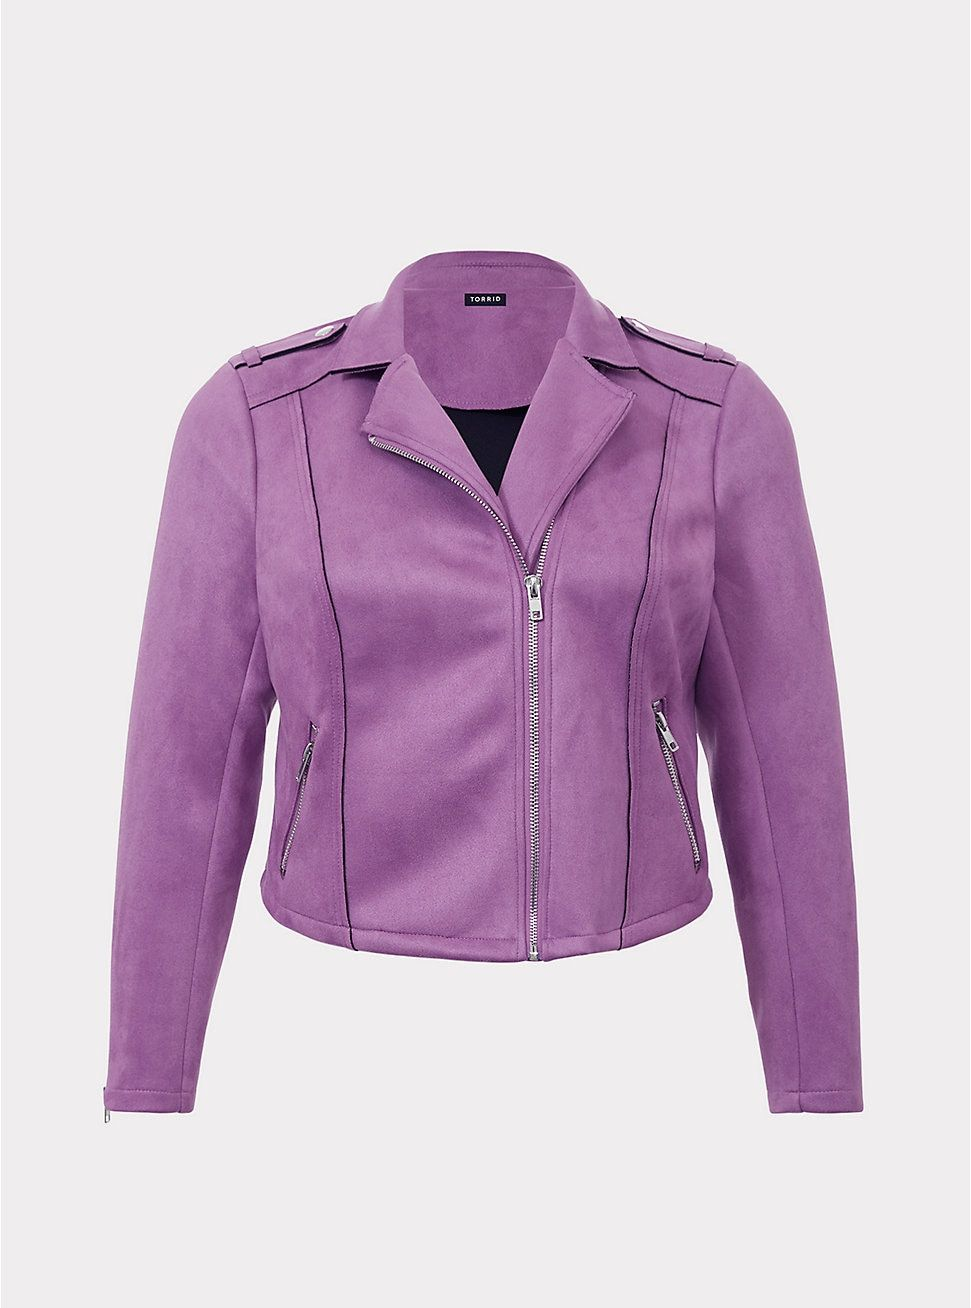 8c450f559a2 Torrid  Purple Suede Moto Jacket